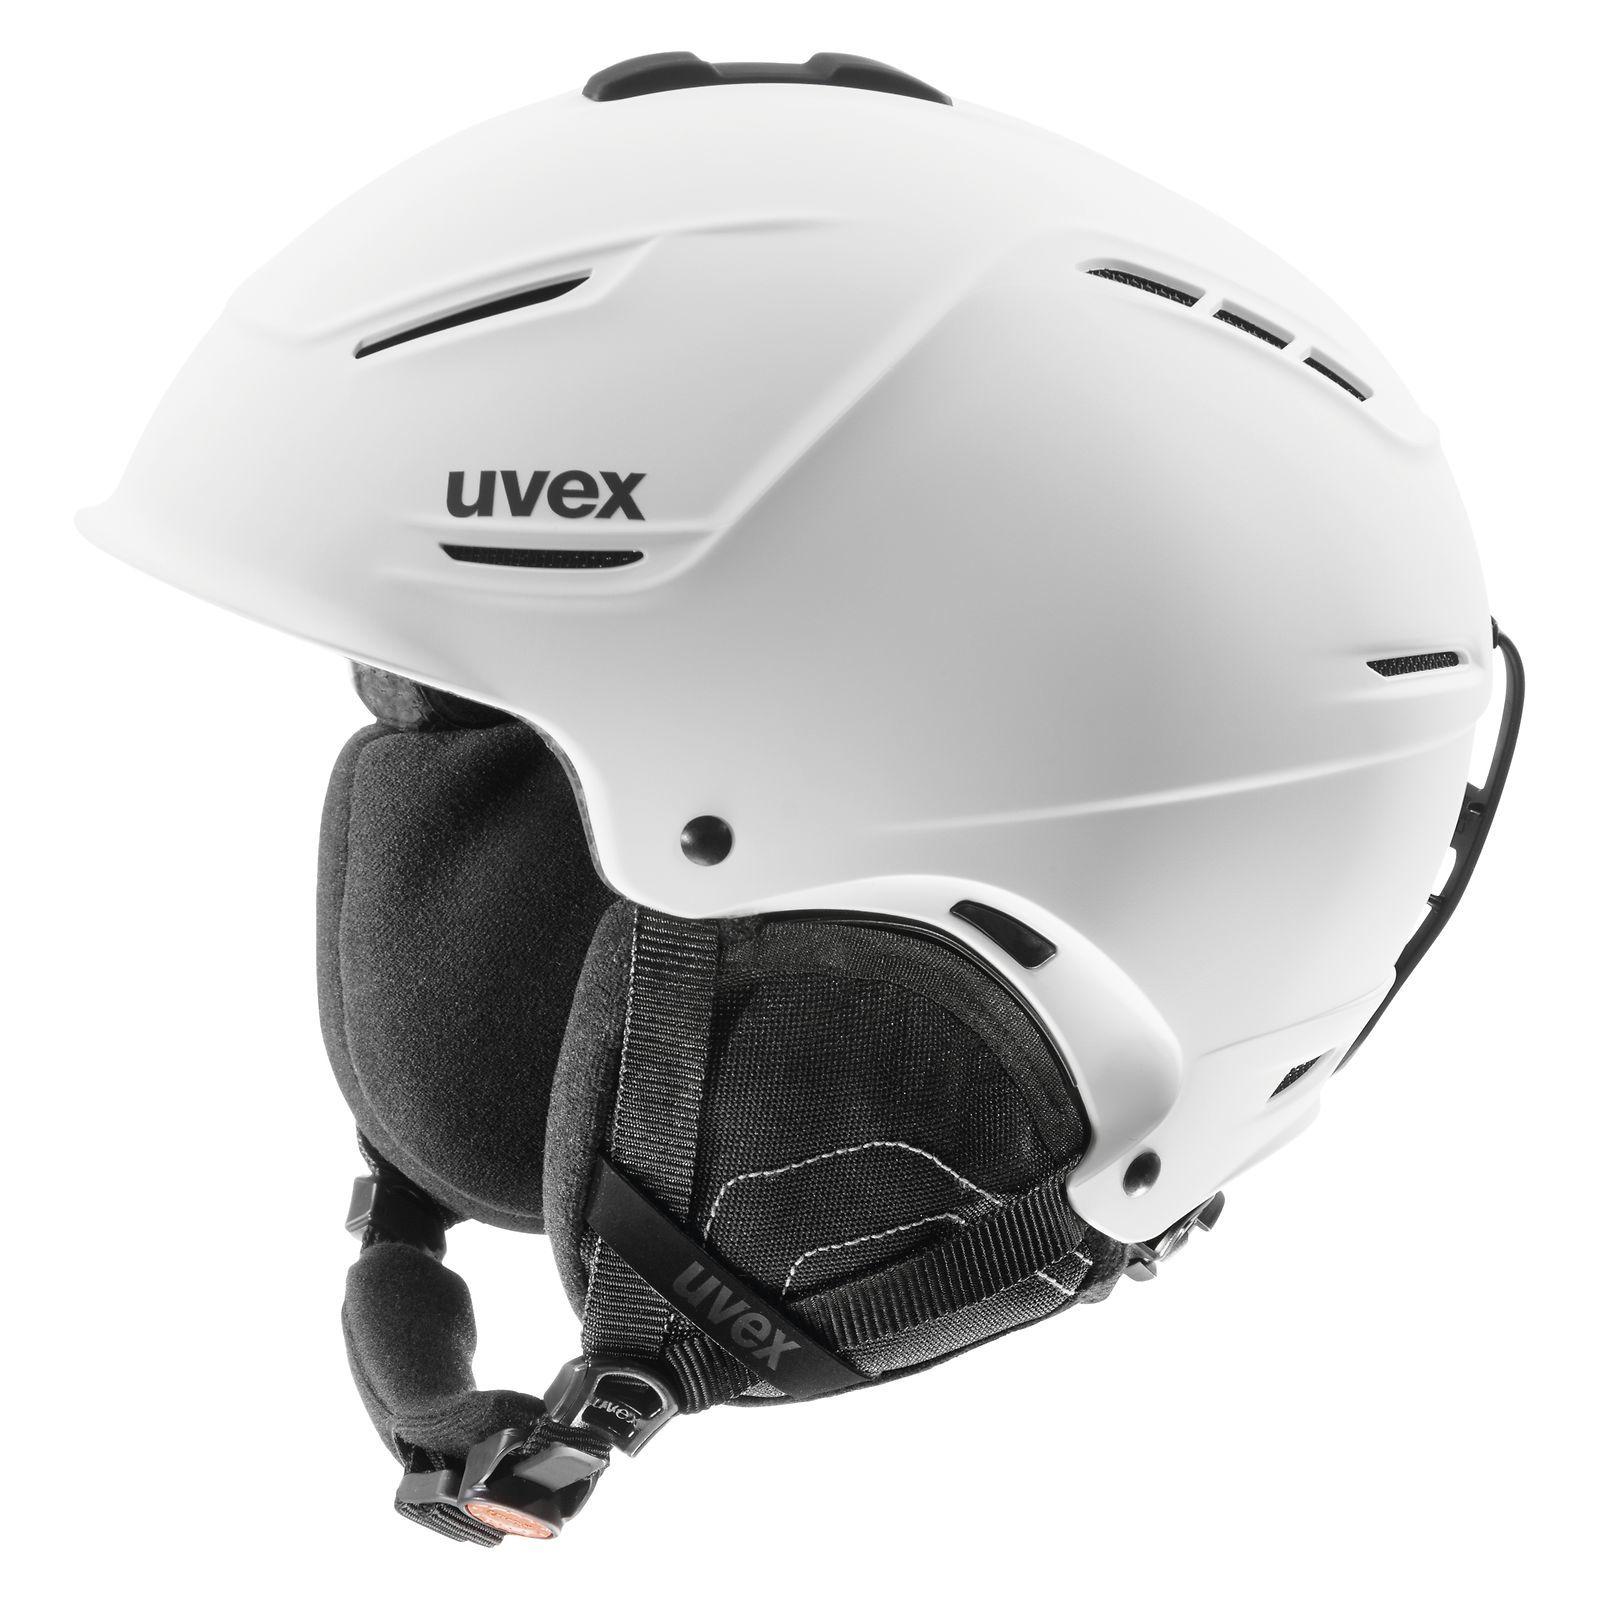 Kask Uvex P1us 566153